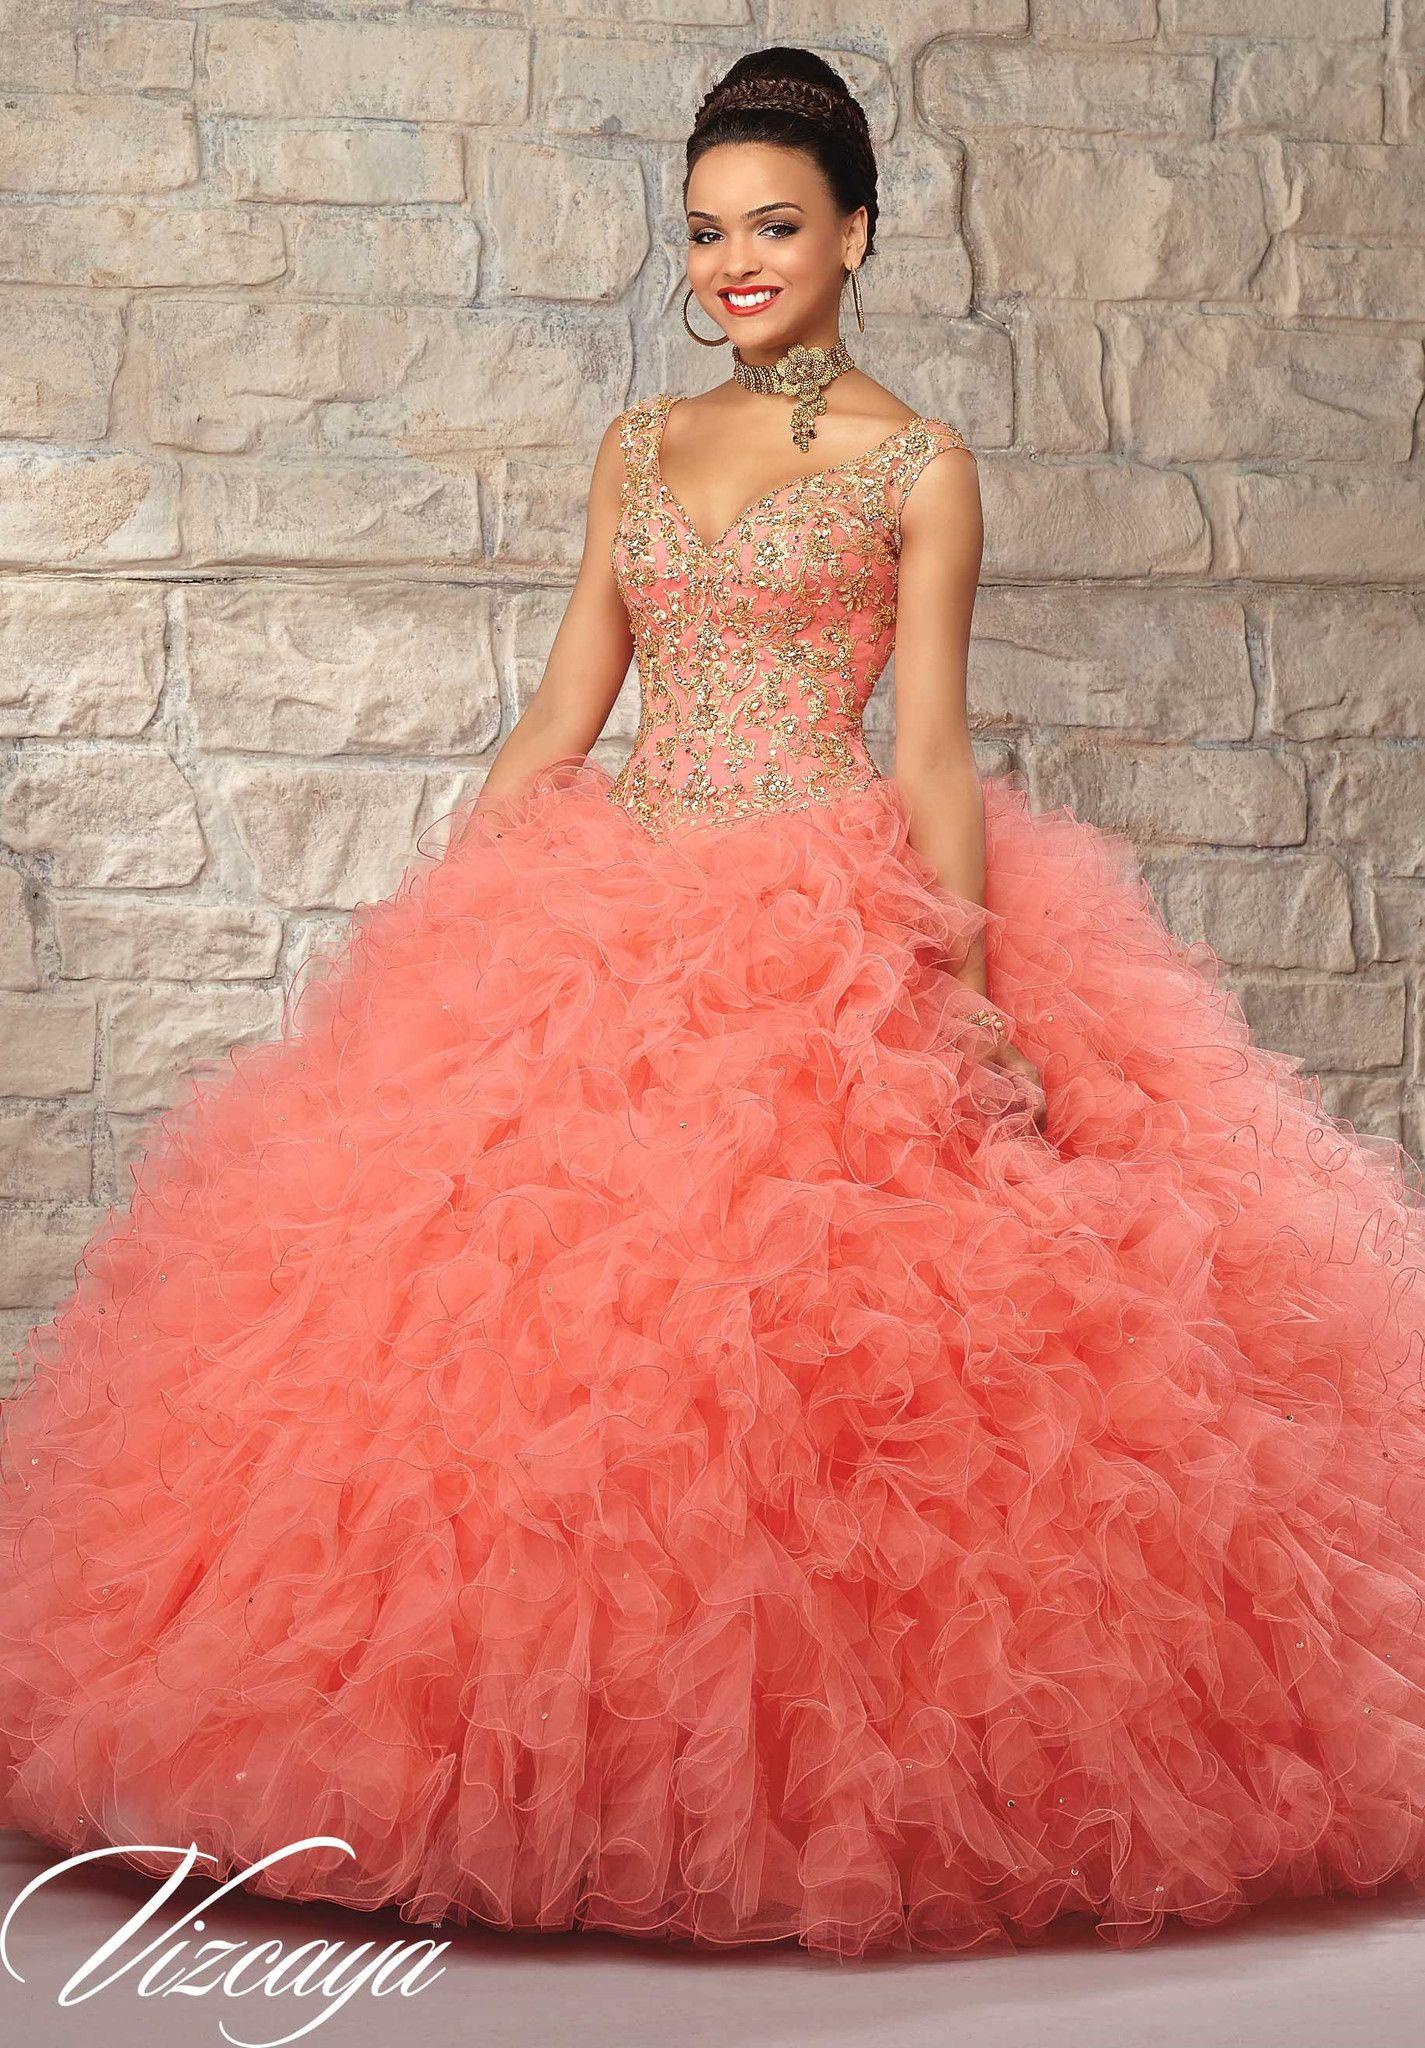 1ba564c49a1 Ruffled V-Neck Quinceanera Dress by Mori Lee Vizcaya 89037